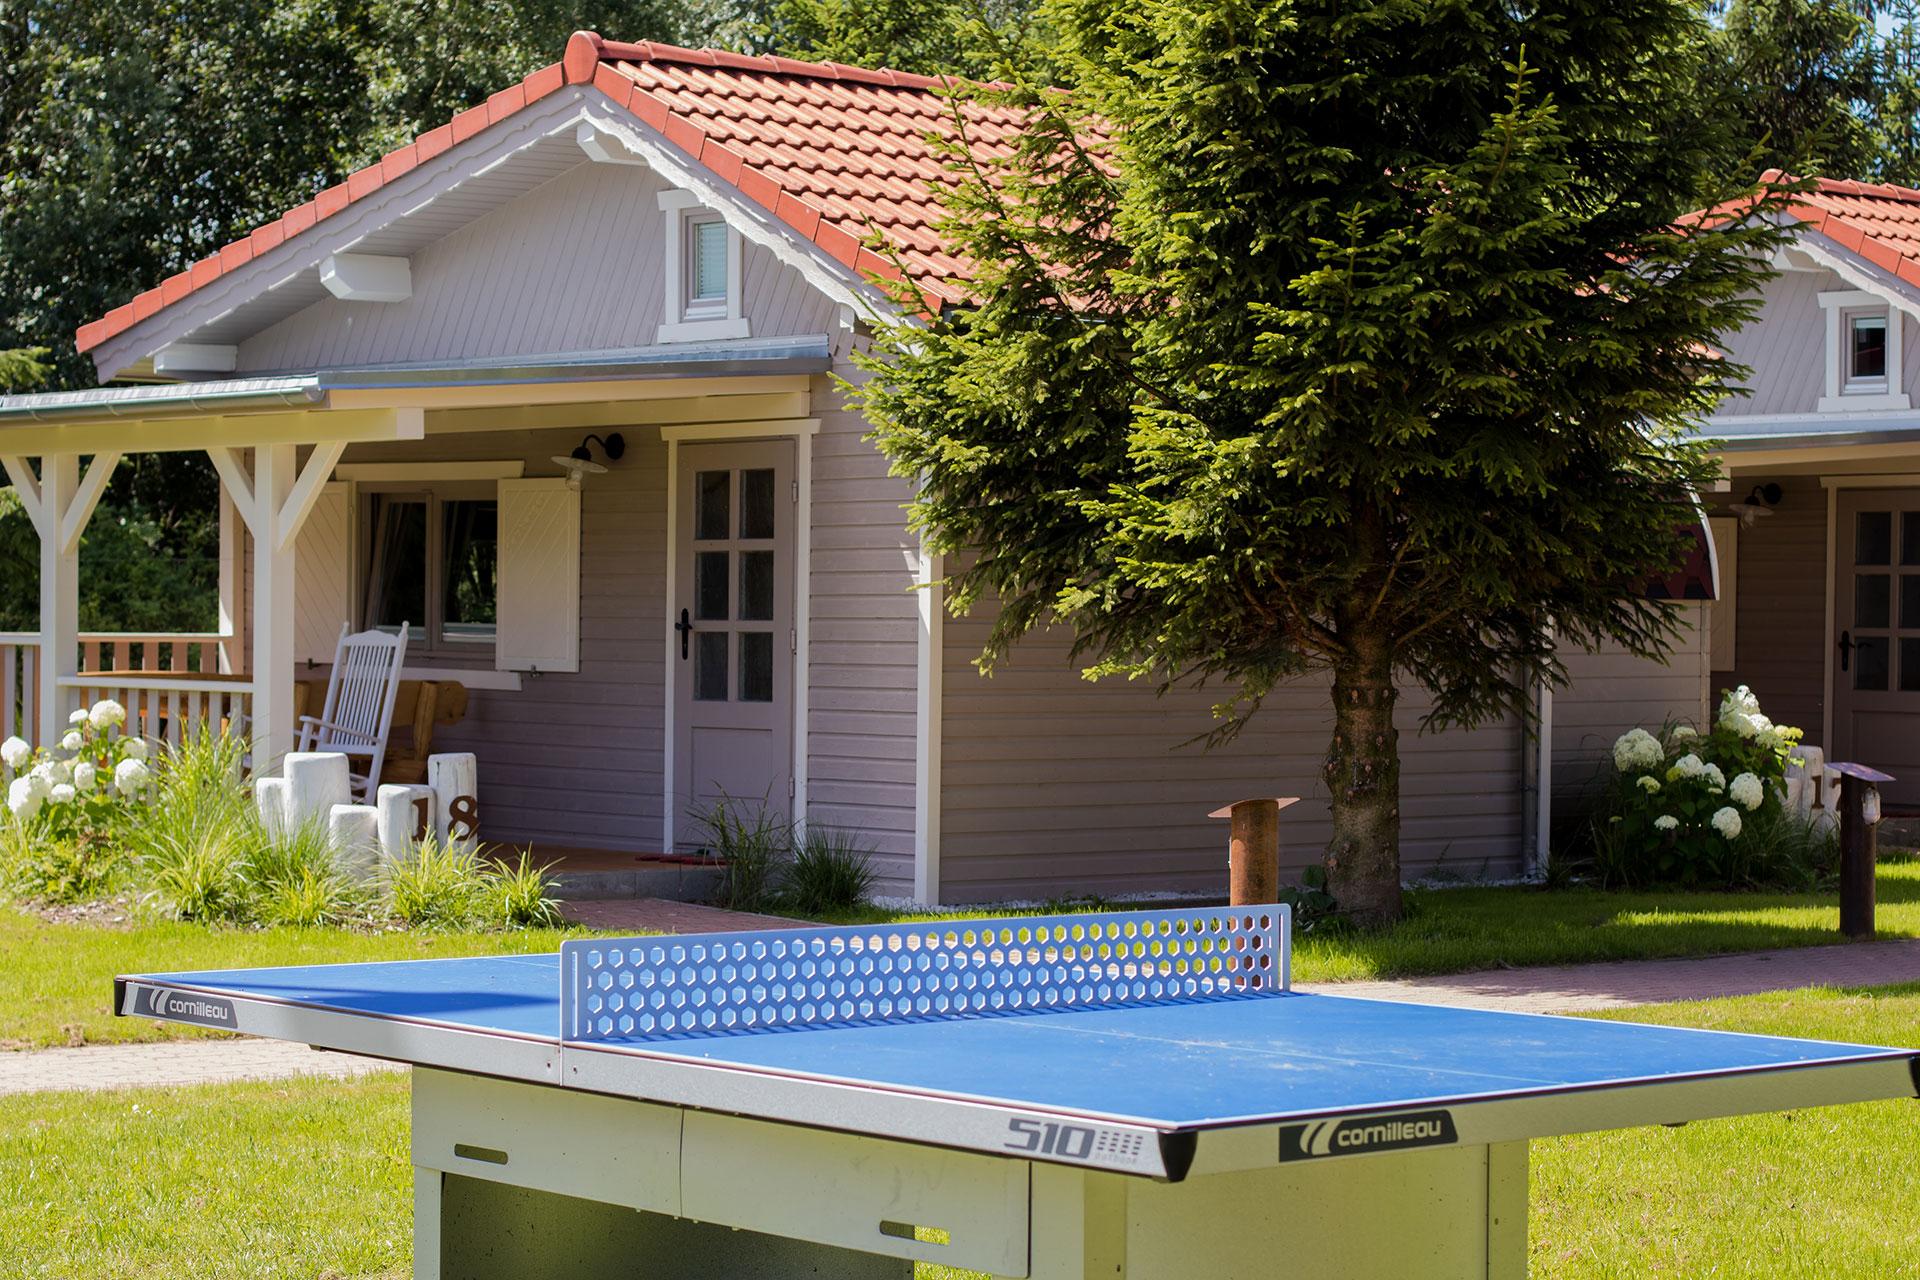 Lieblings-Lauben Rövershagen Tischtennis